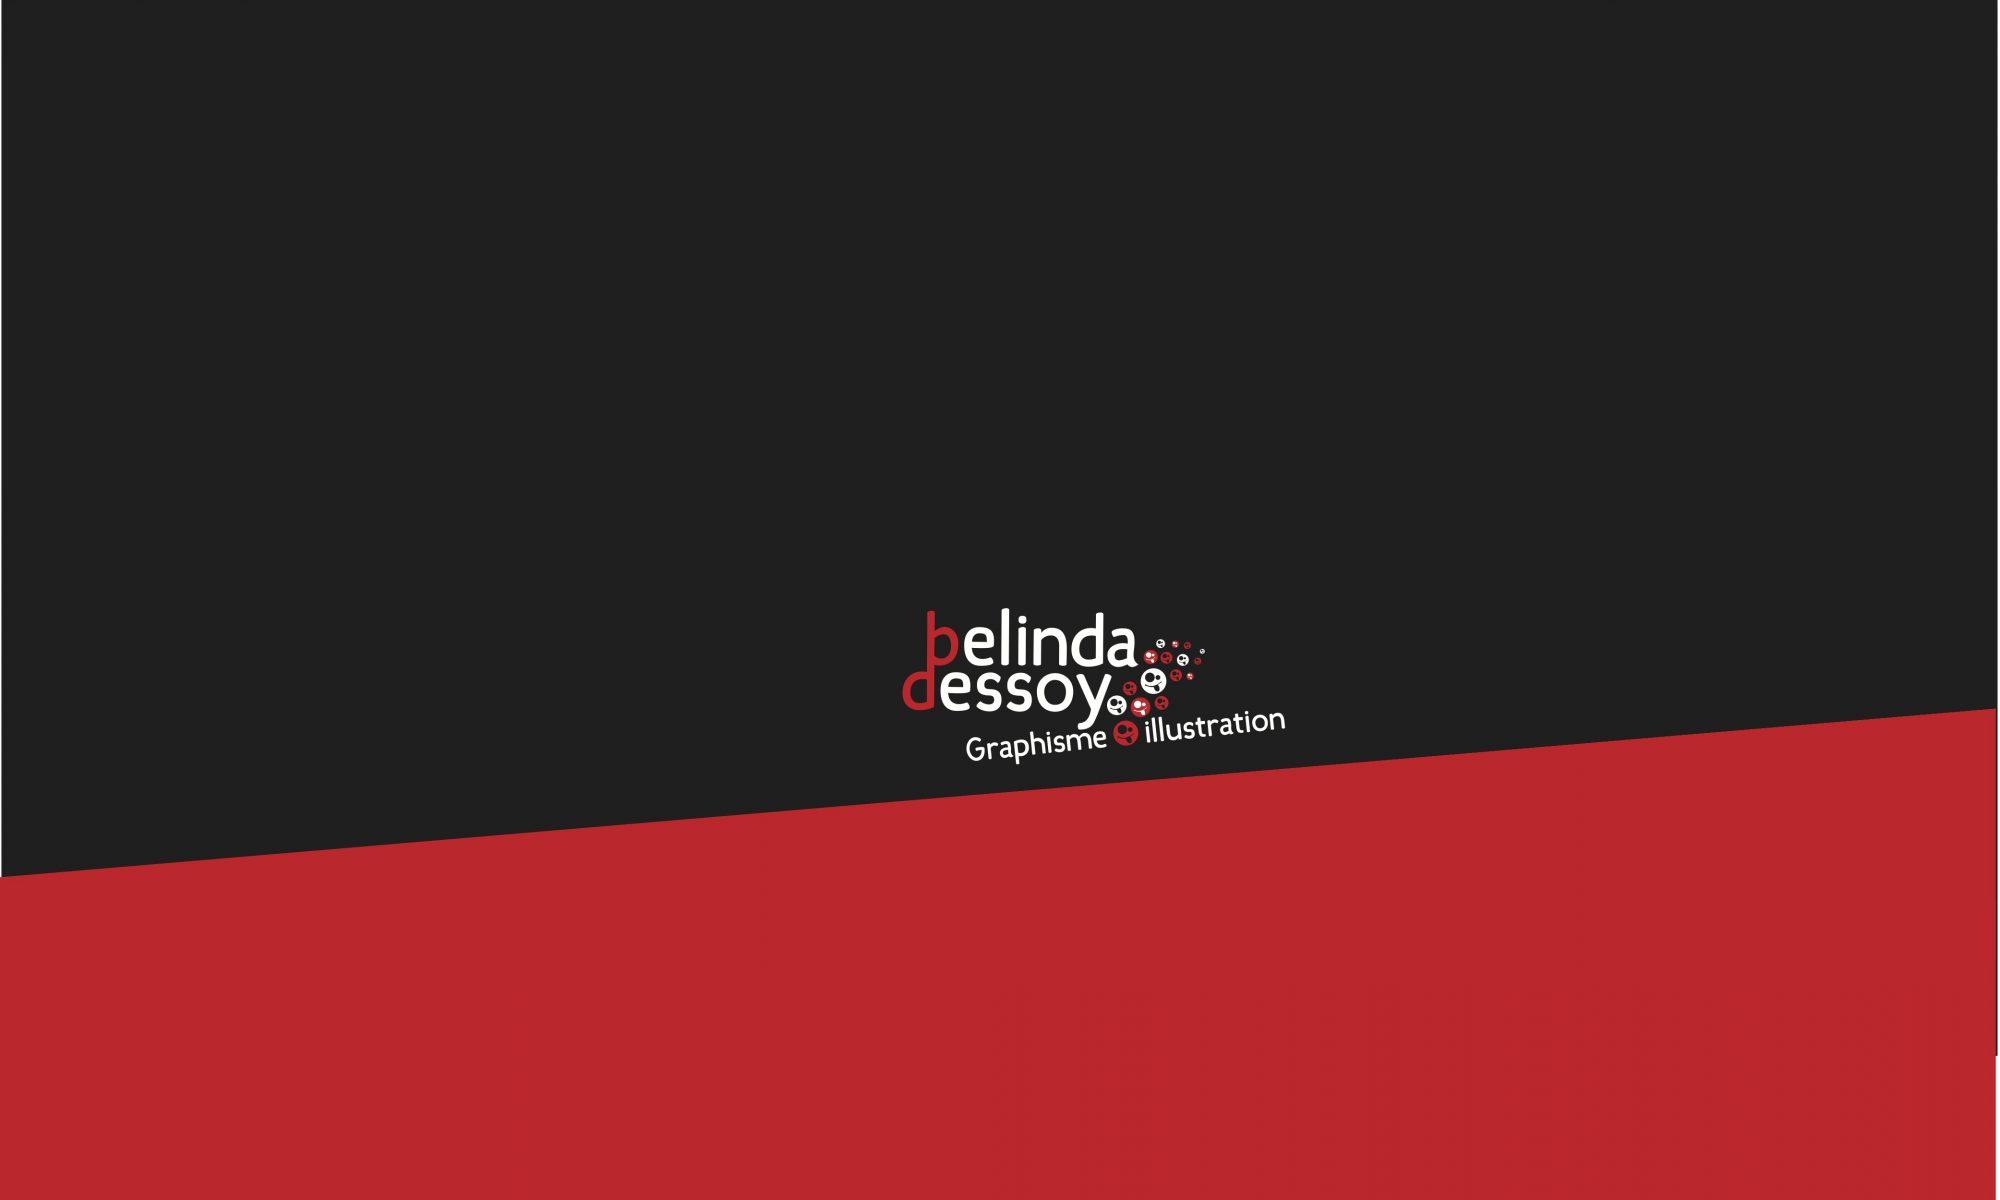 Bélinda Dessoy